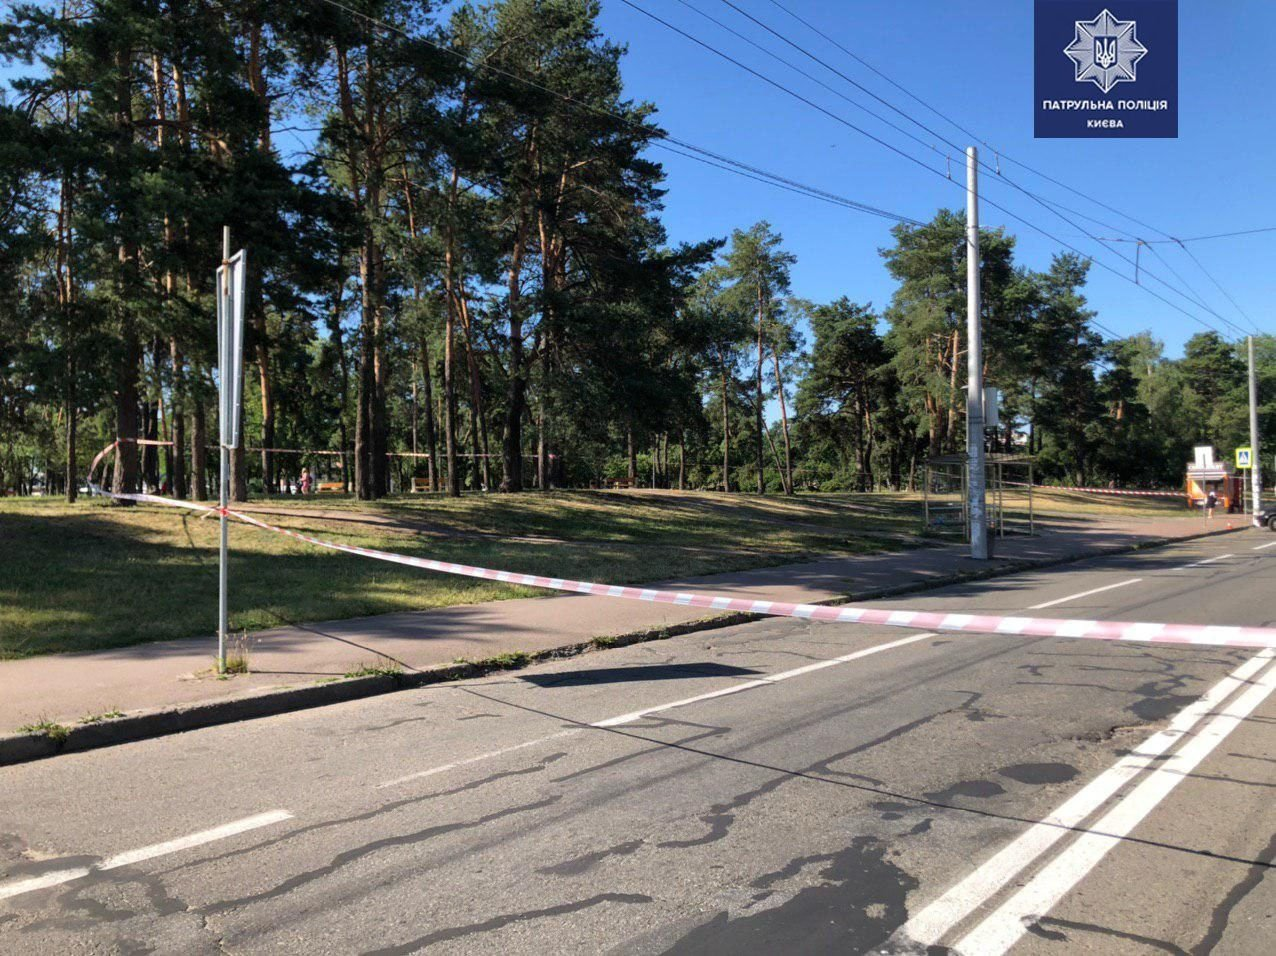 В Киеве перекрыли дорогу недалеко от станции метро: детали , фото-1